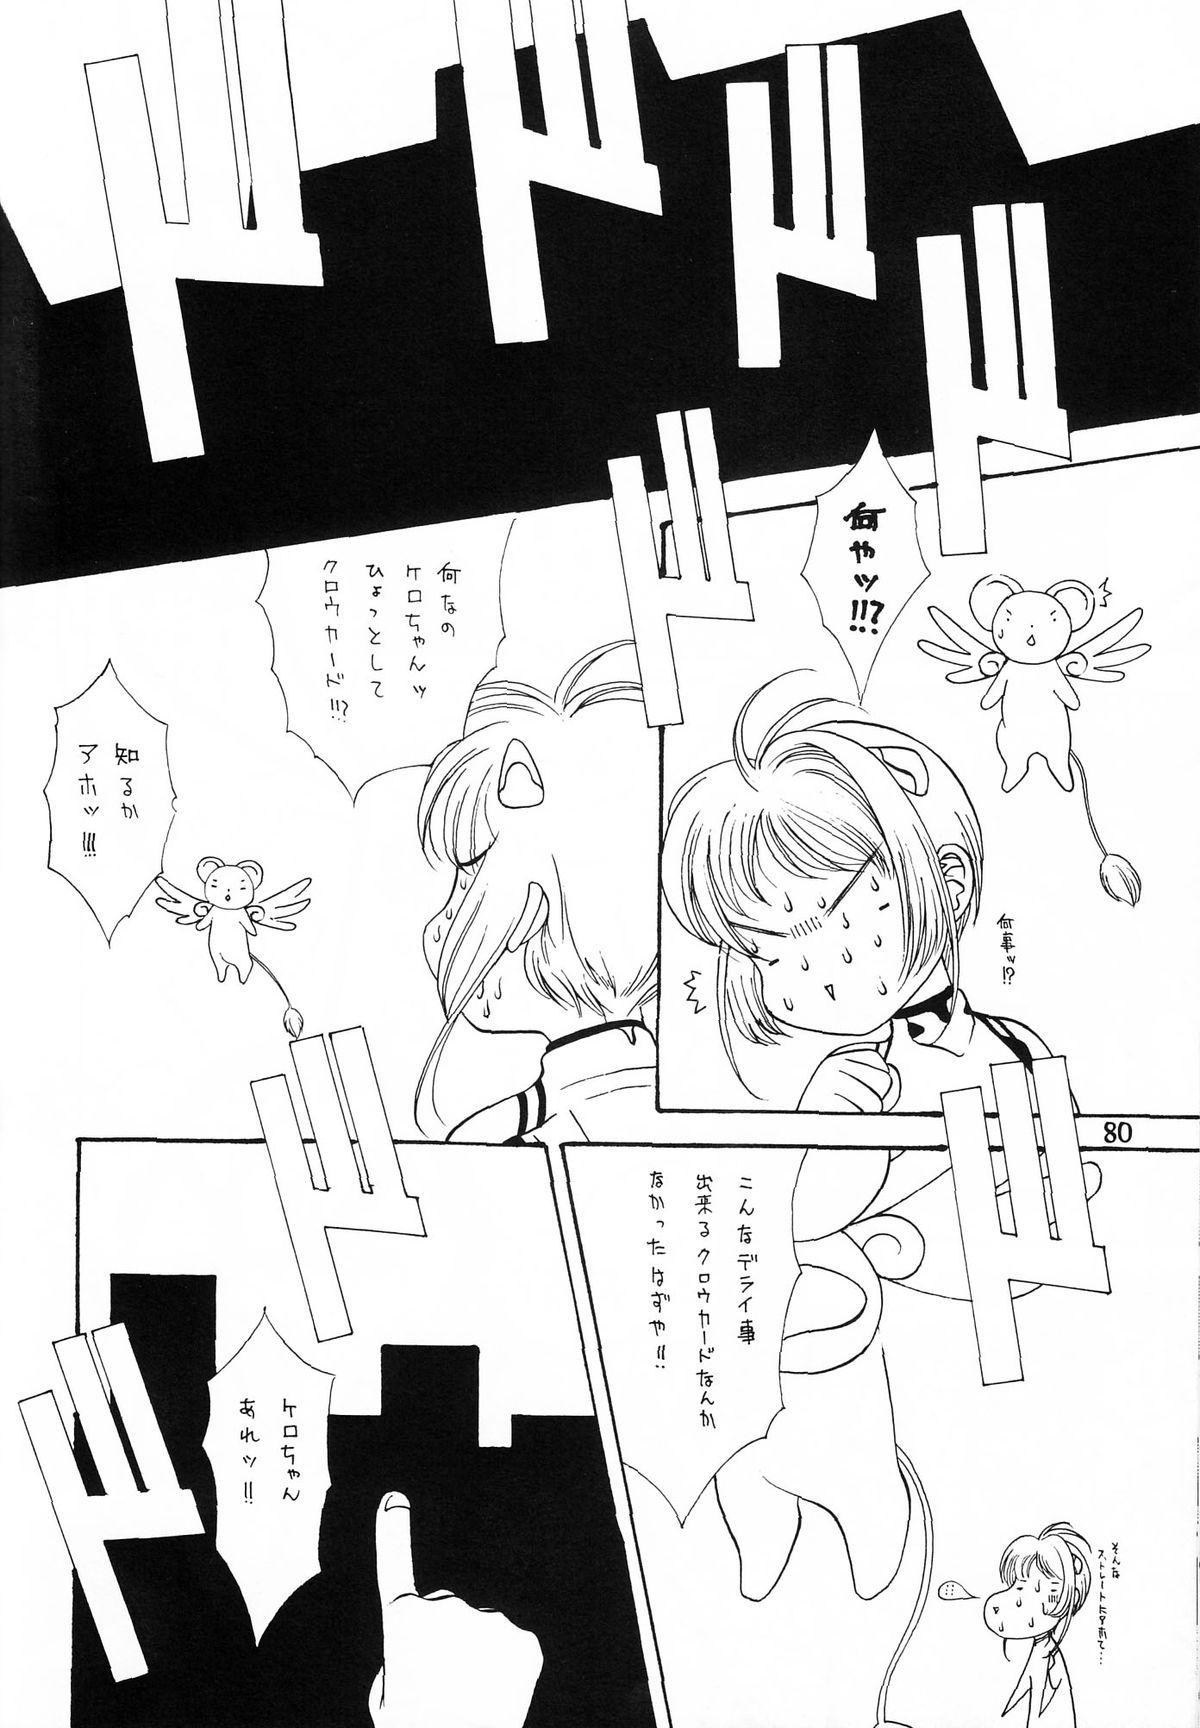 Henrei-kai '98 Natsu SPECIAL 79